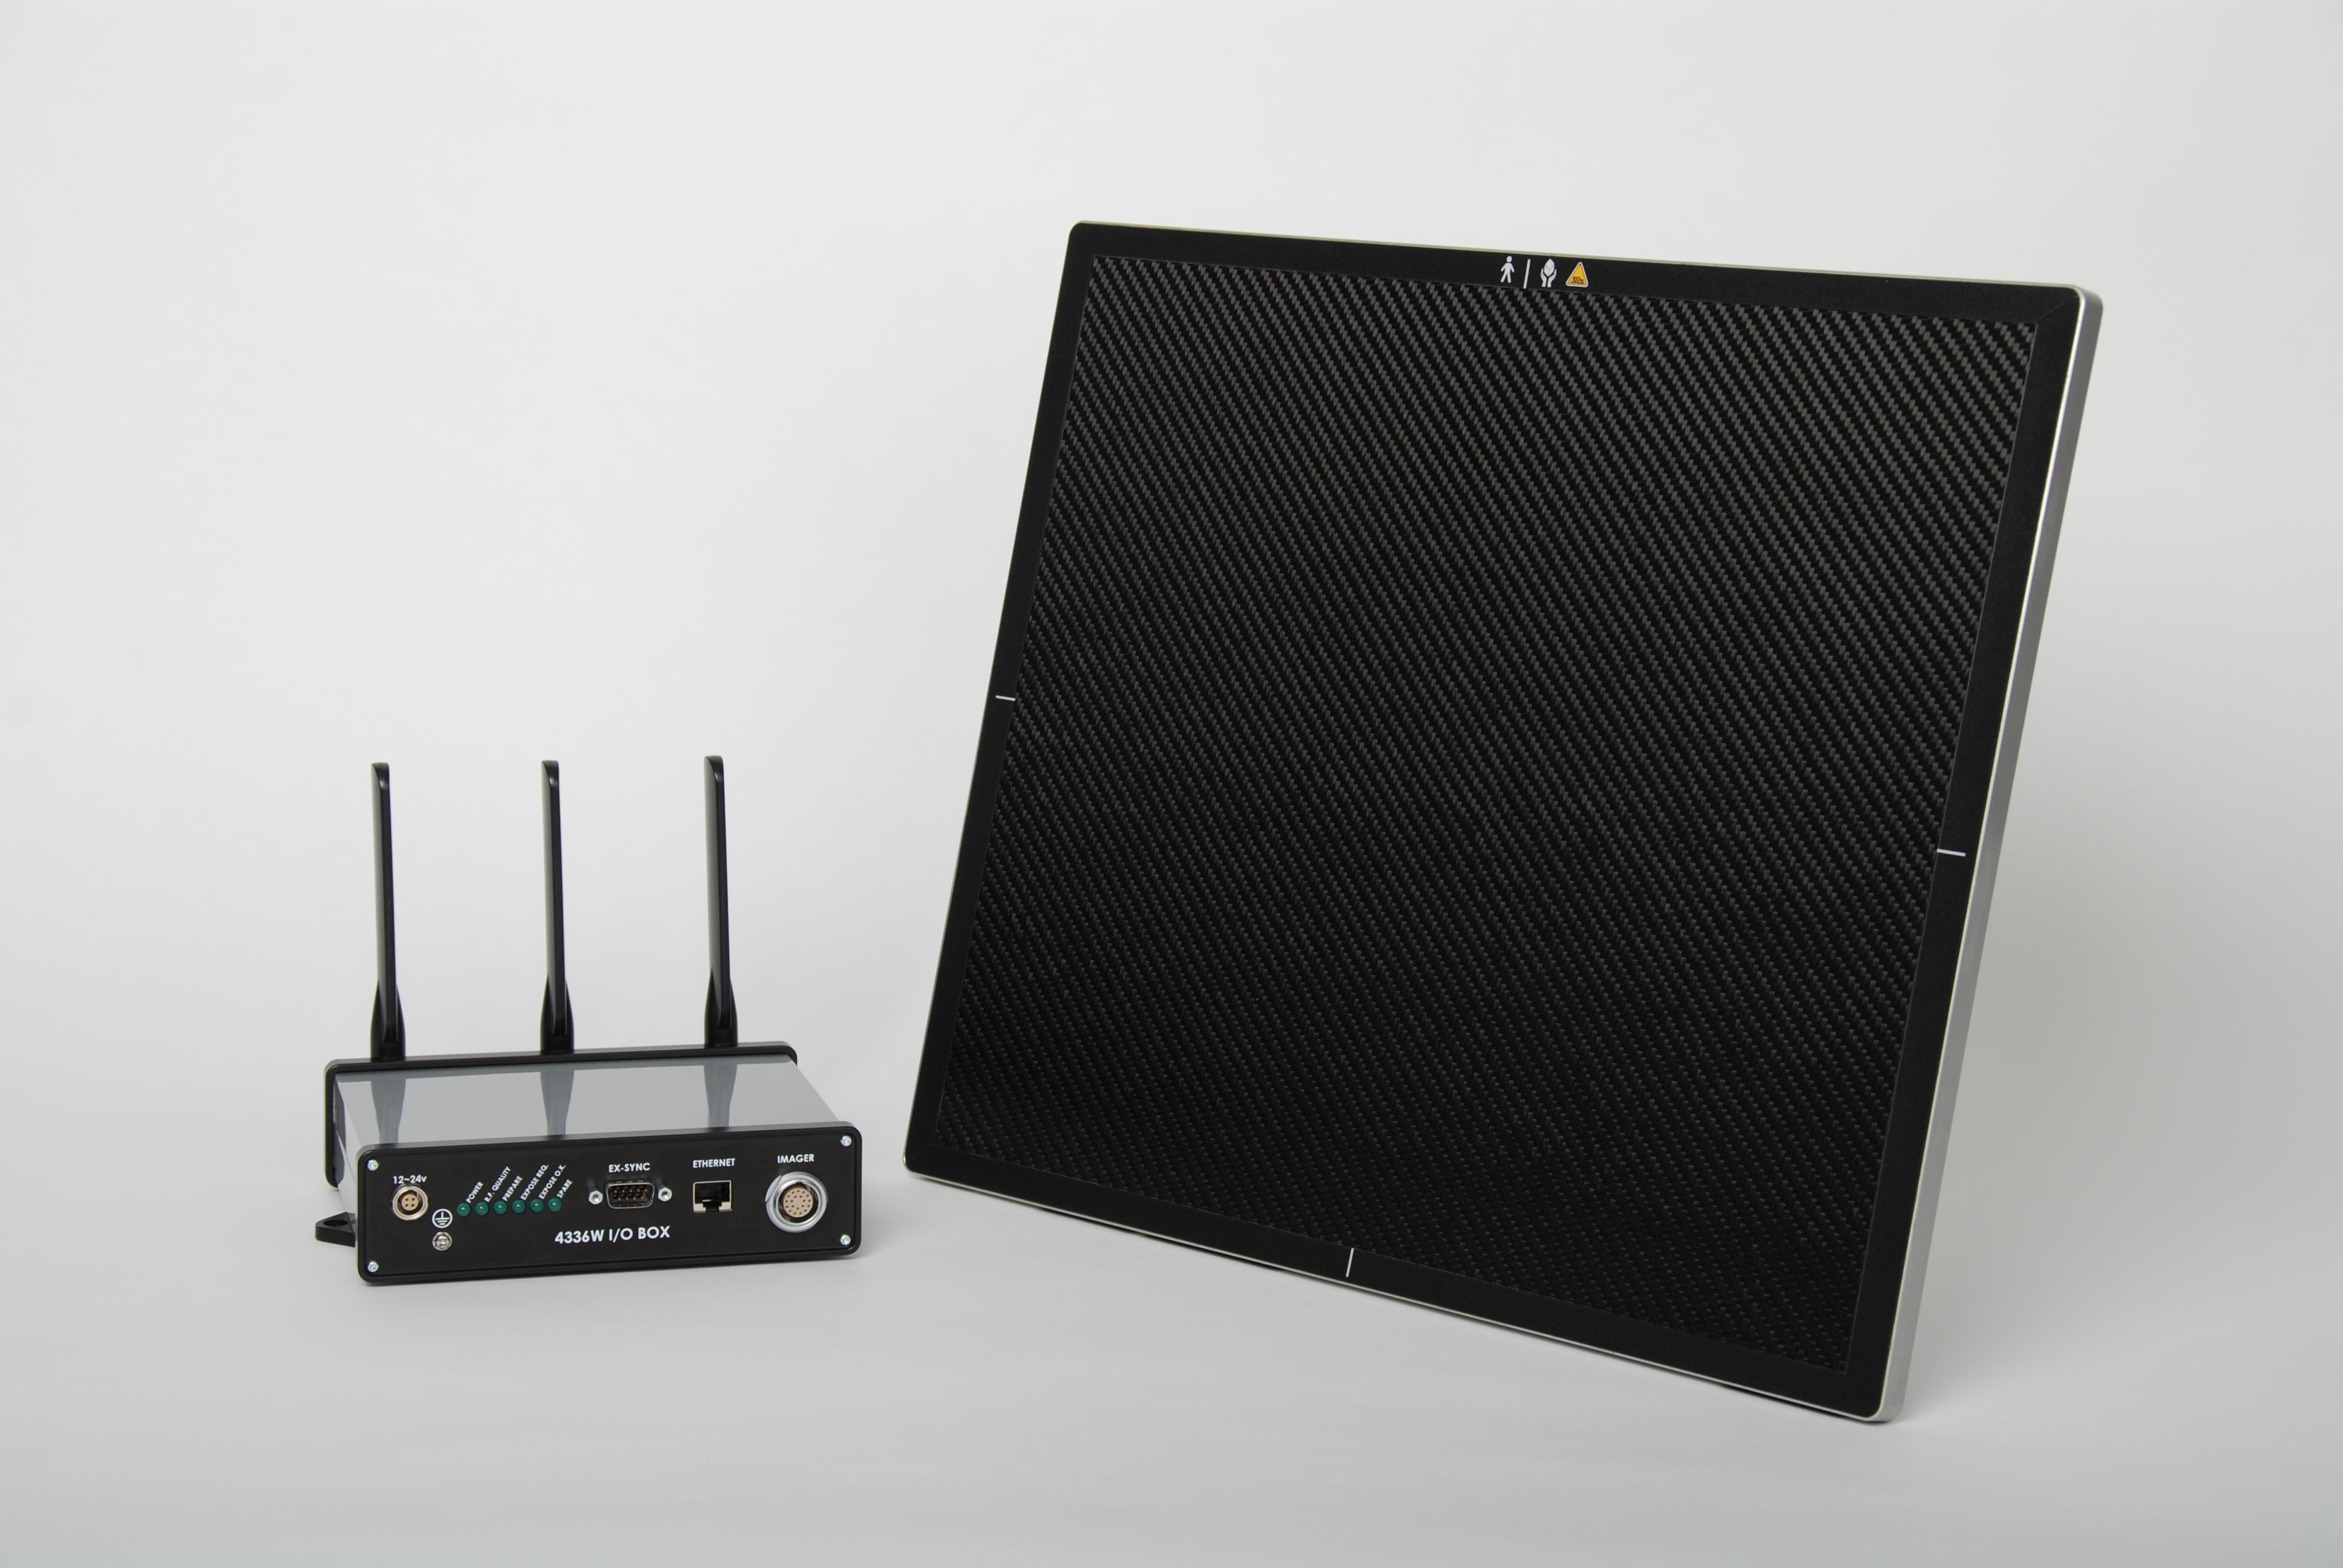 varian paxscan wireless detectors 4336w 2530w xray